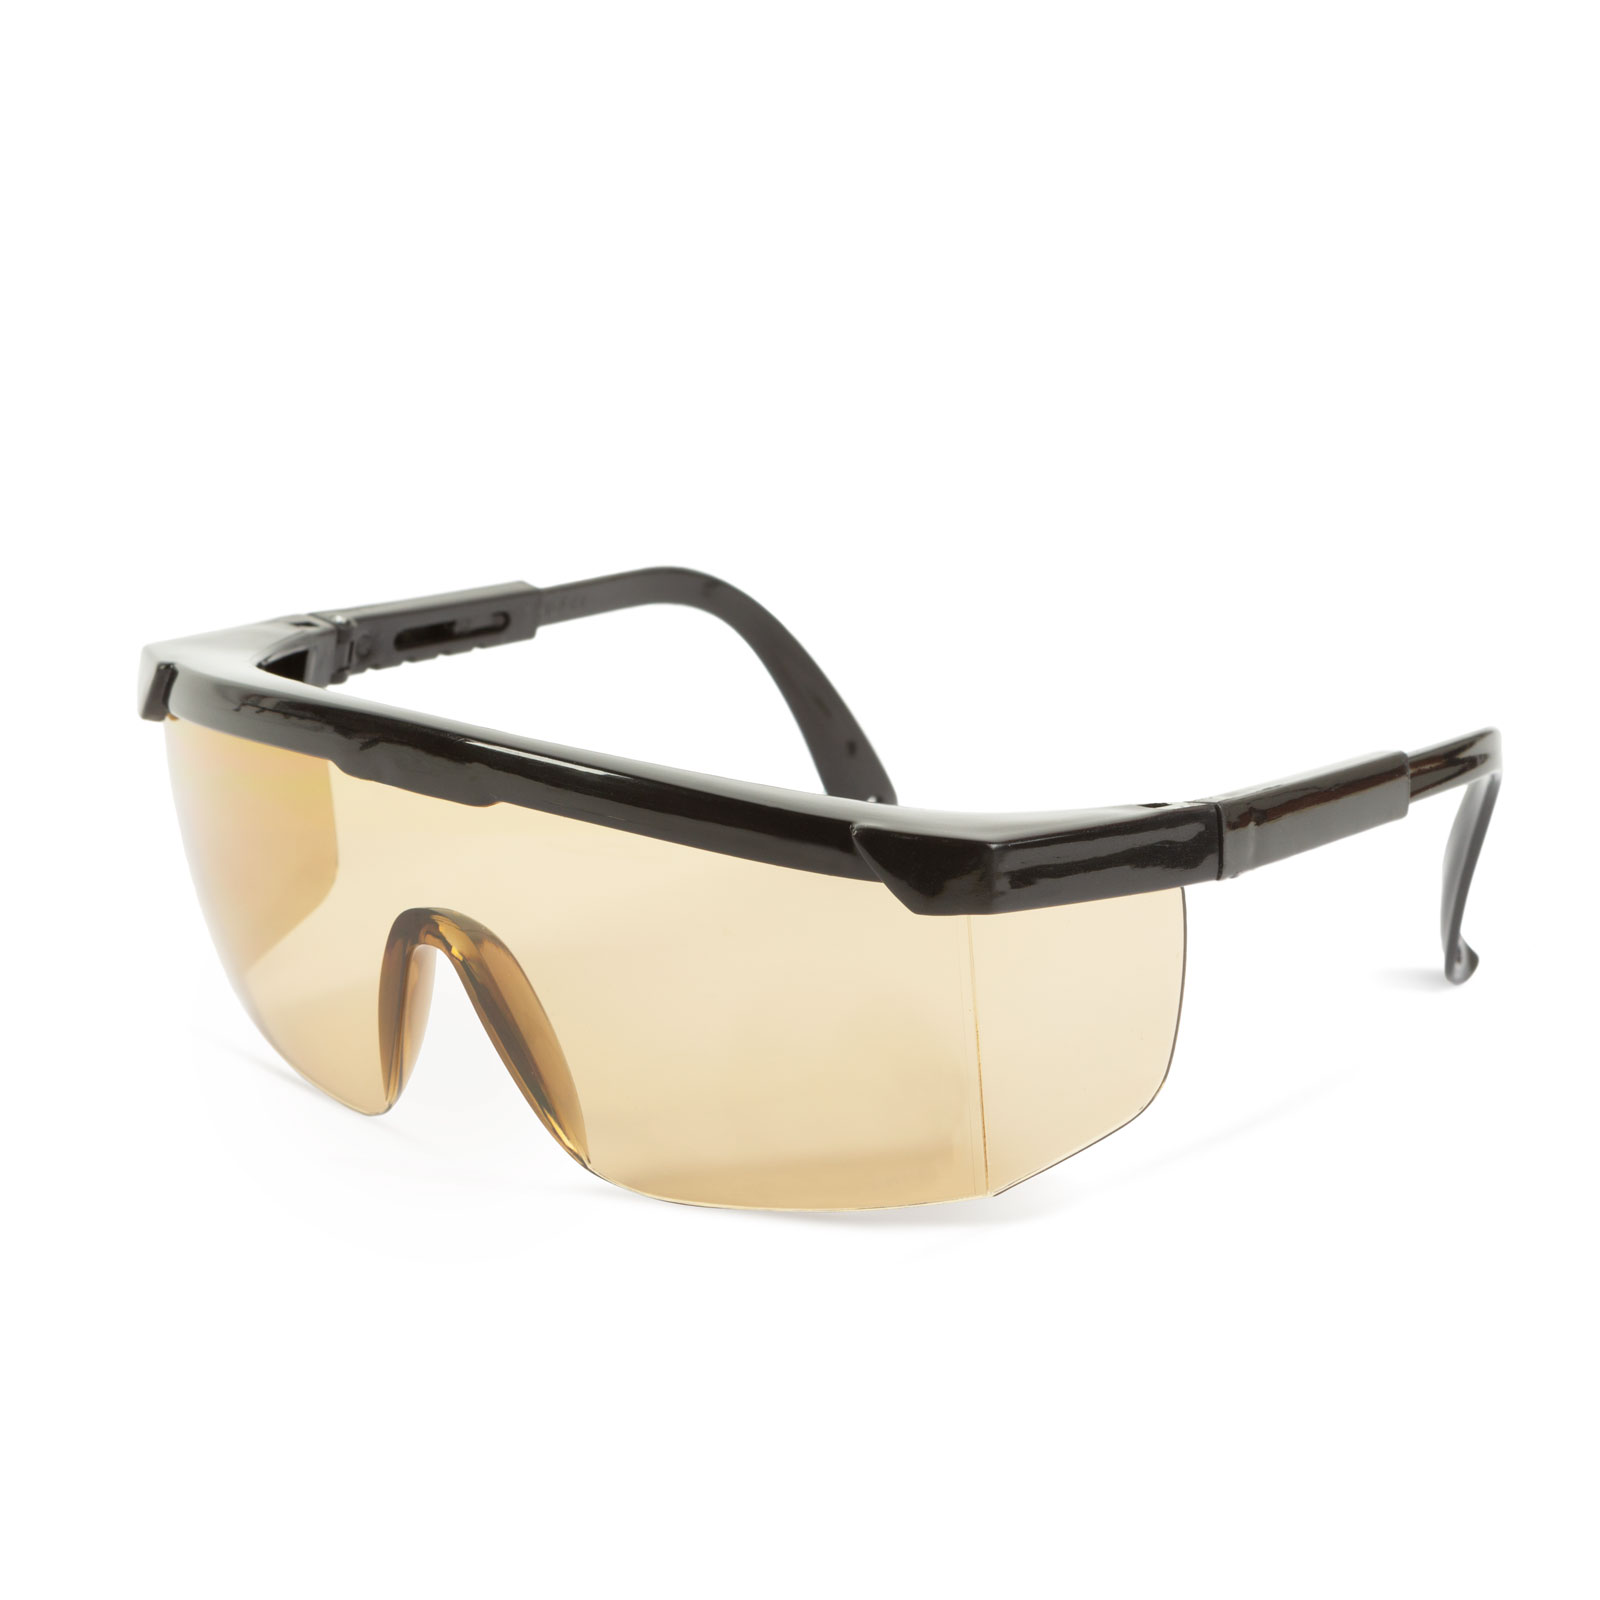 Ochelari de protectie anti UV profesionali, pentru persoanele cu ochelari